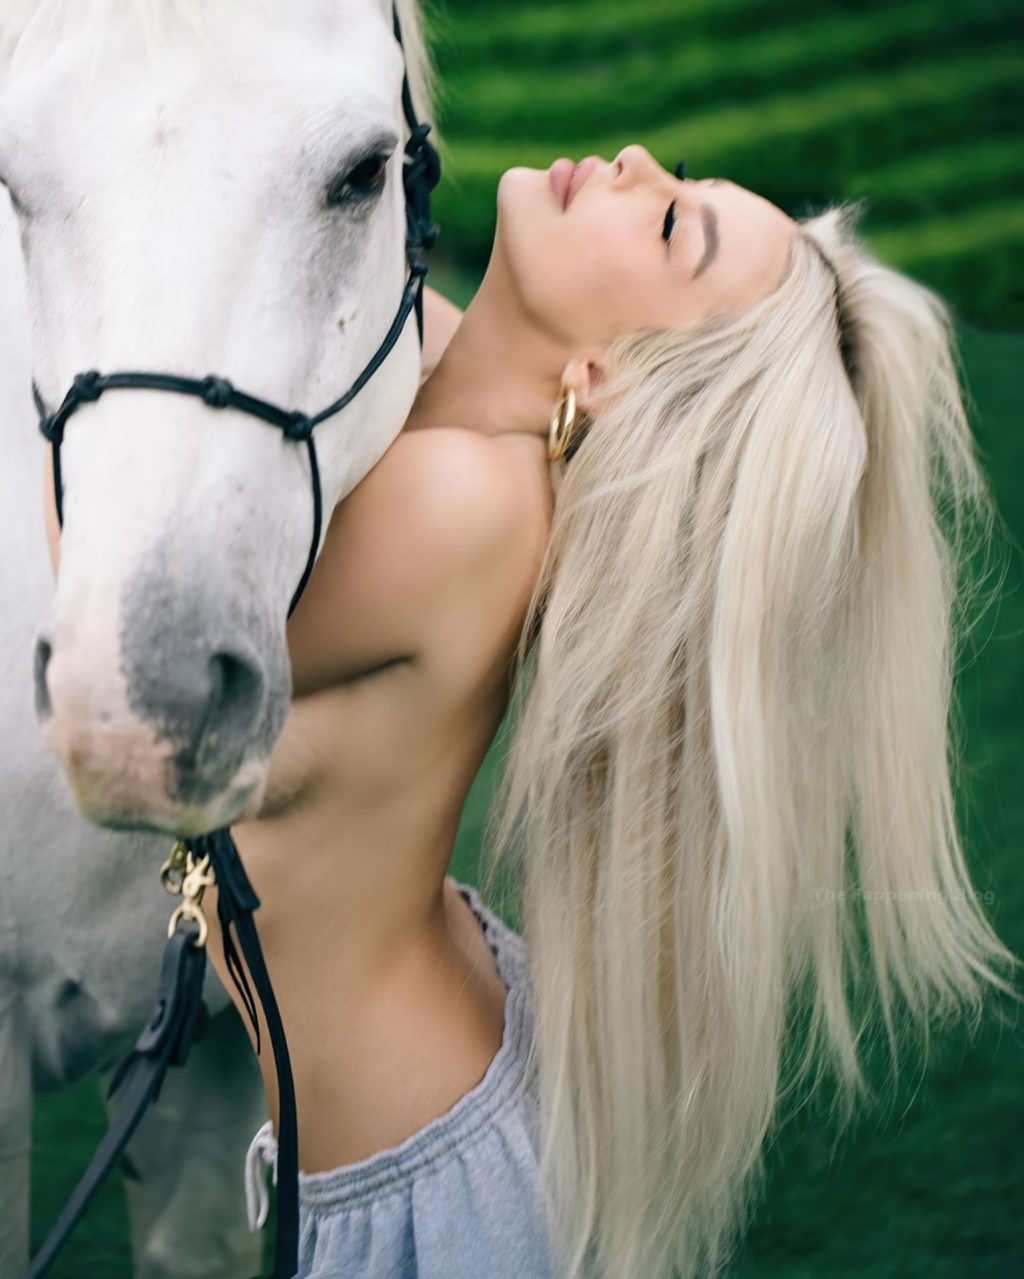 Tana Mongeau Topless (5 Photos)